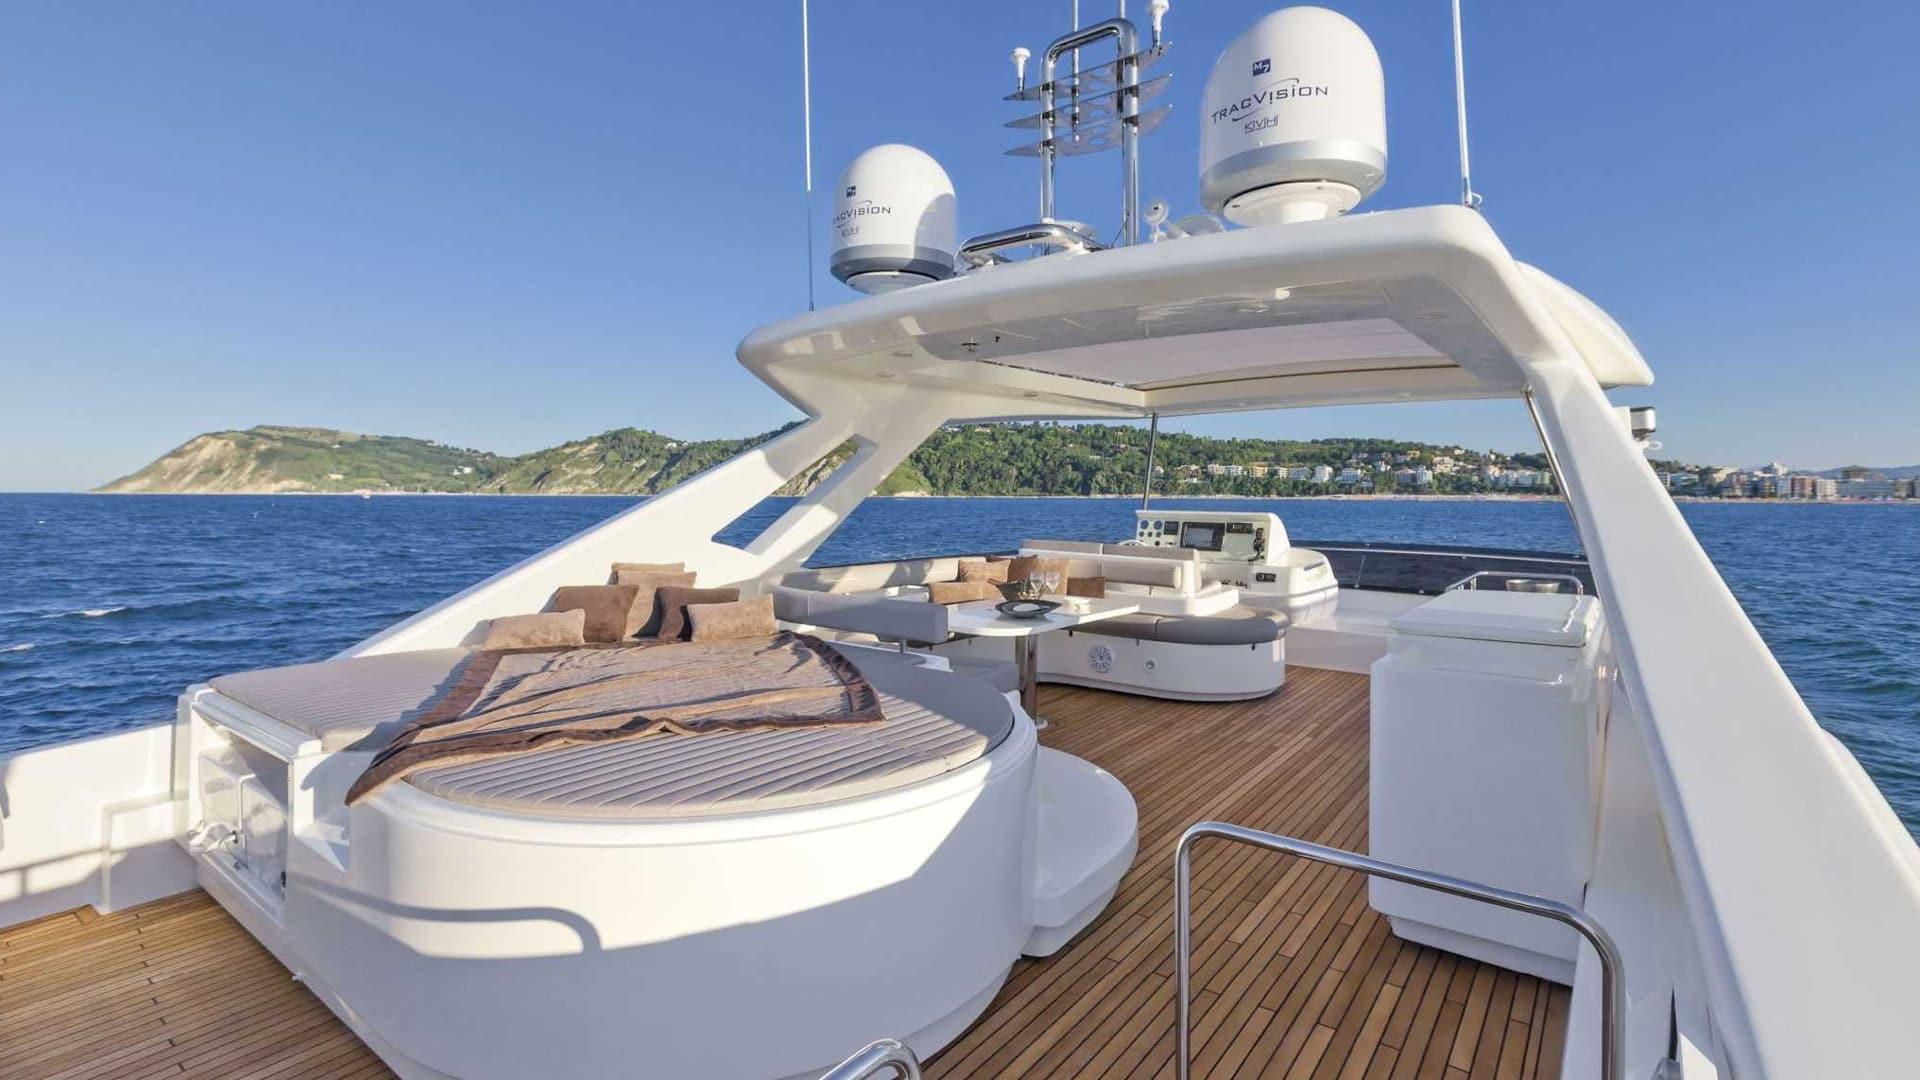 Ferretti Yachts - Italian yacht interior fabrics